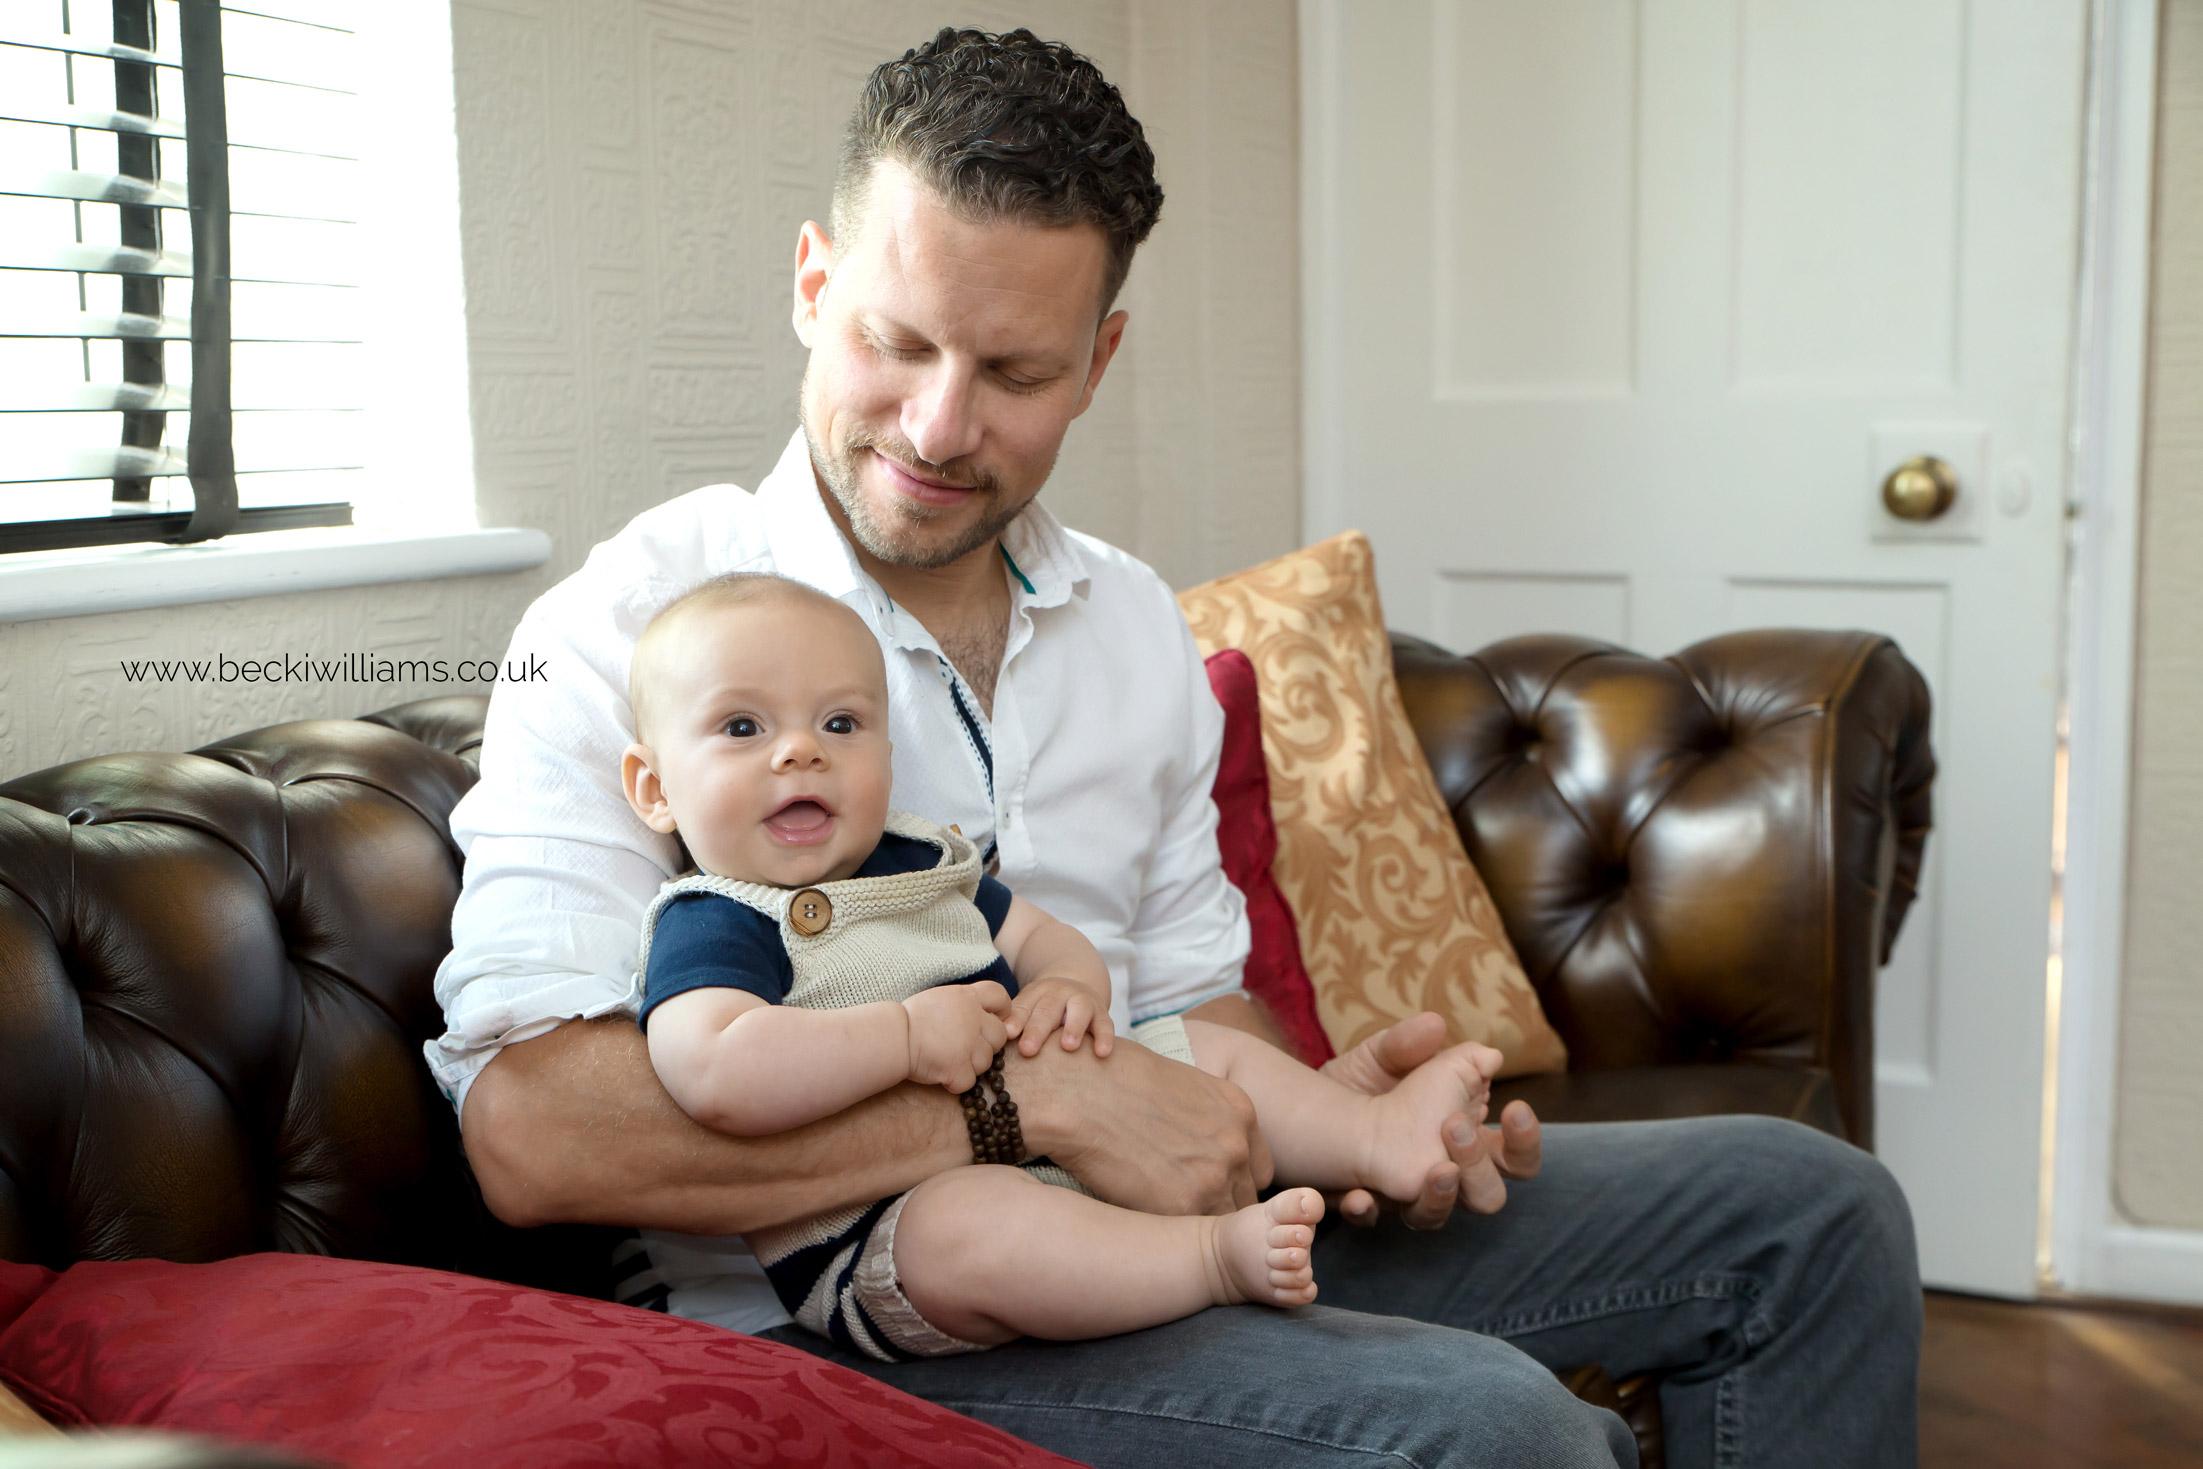 newborn-photographer-edgware-baby-dad-relaxed.jpg